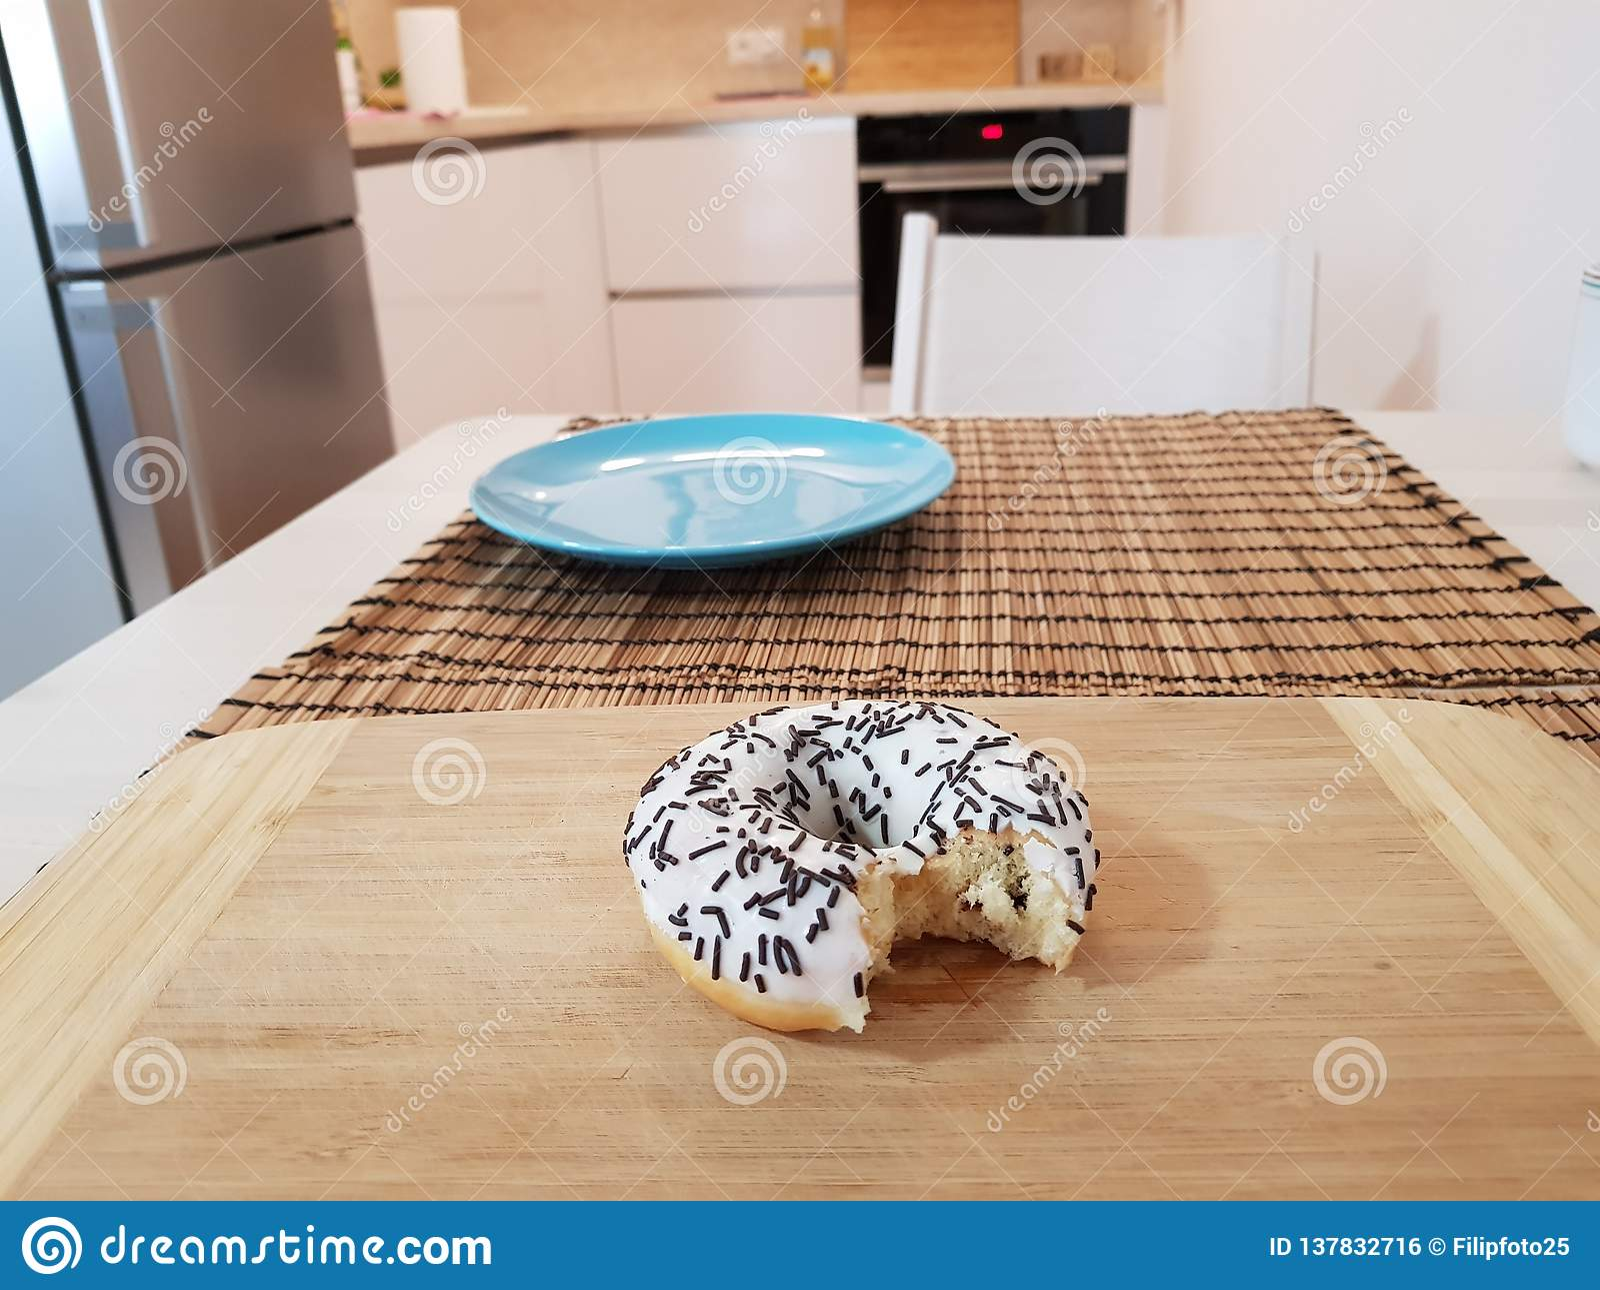 Eat The Donut Stock Photo Image Of Missing Cake Wood 137832716